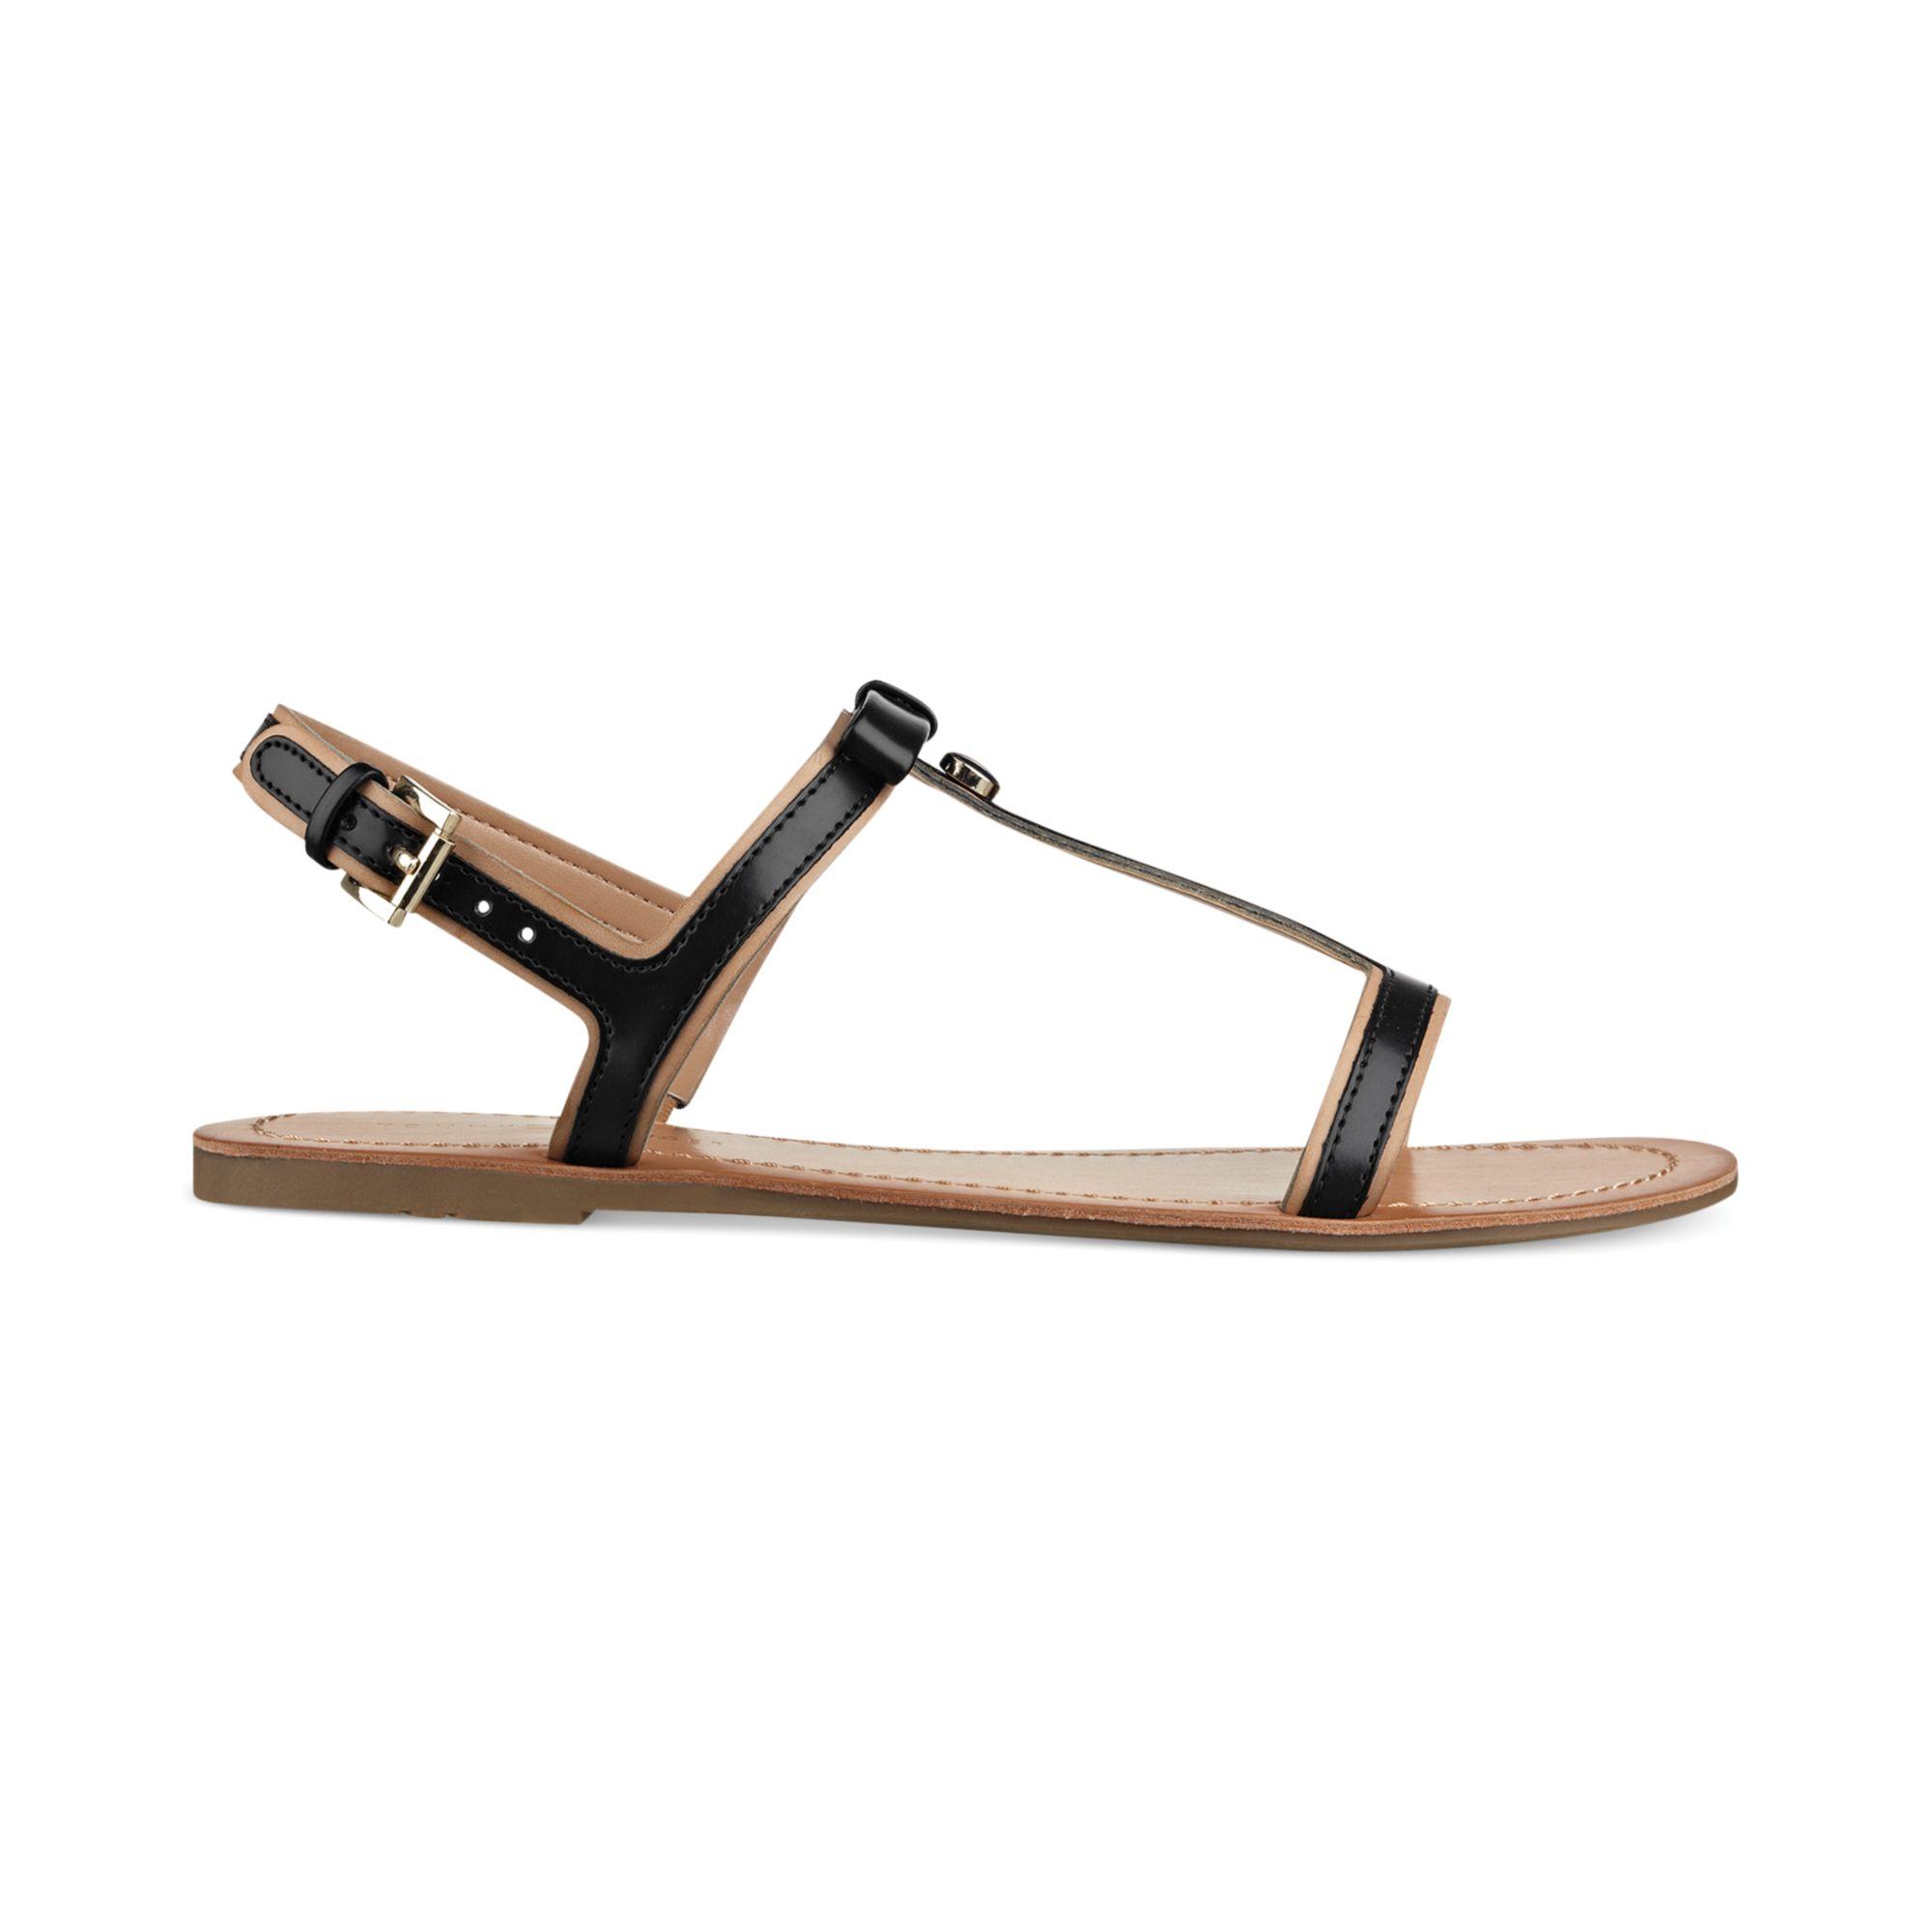 8db912d421970 ... Lyst - Tommy Hilfiger Womens Lisel Flat Sandals in Black super cheap  a5682 d5762 ...